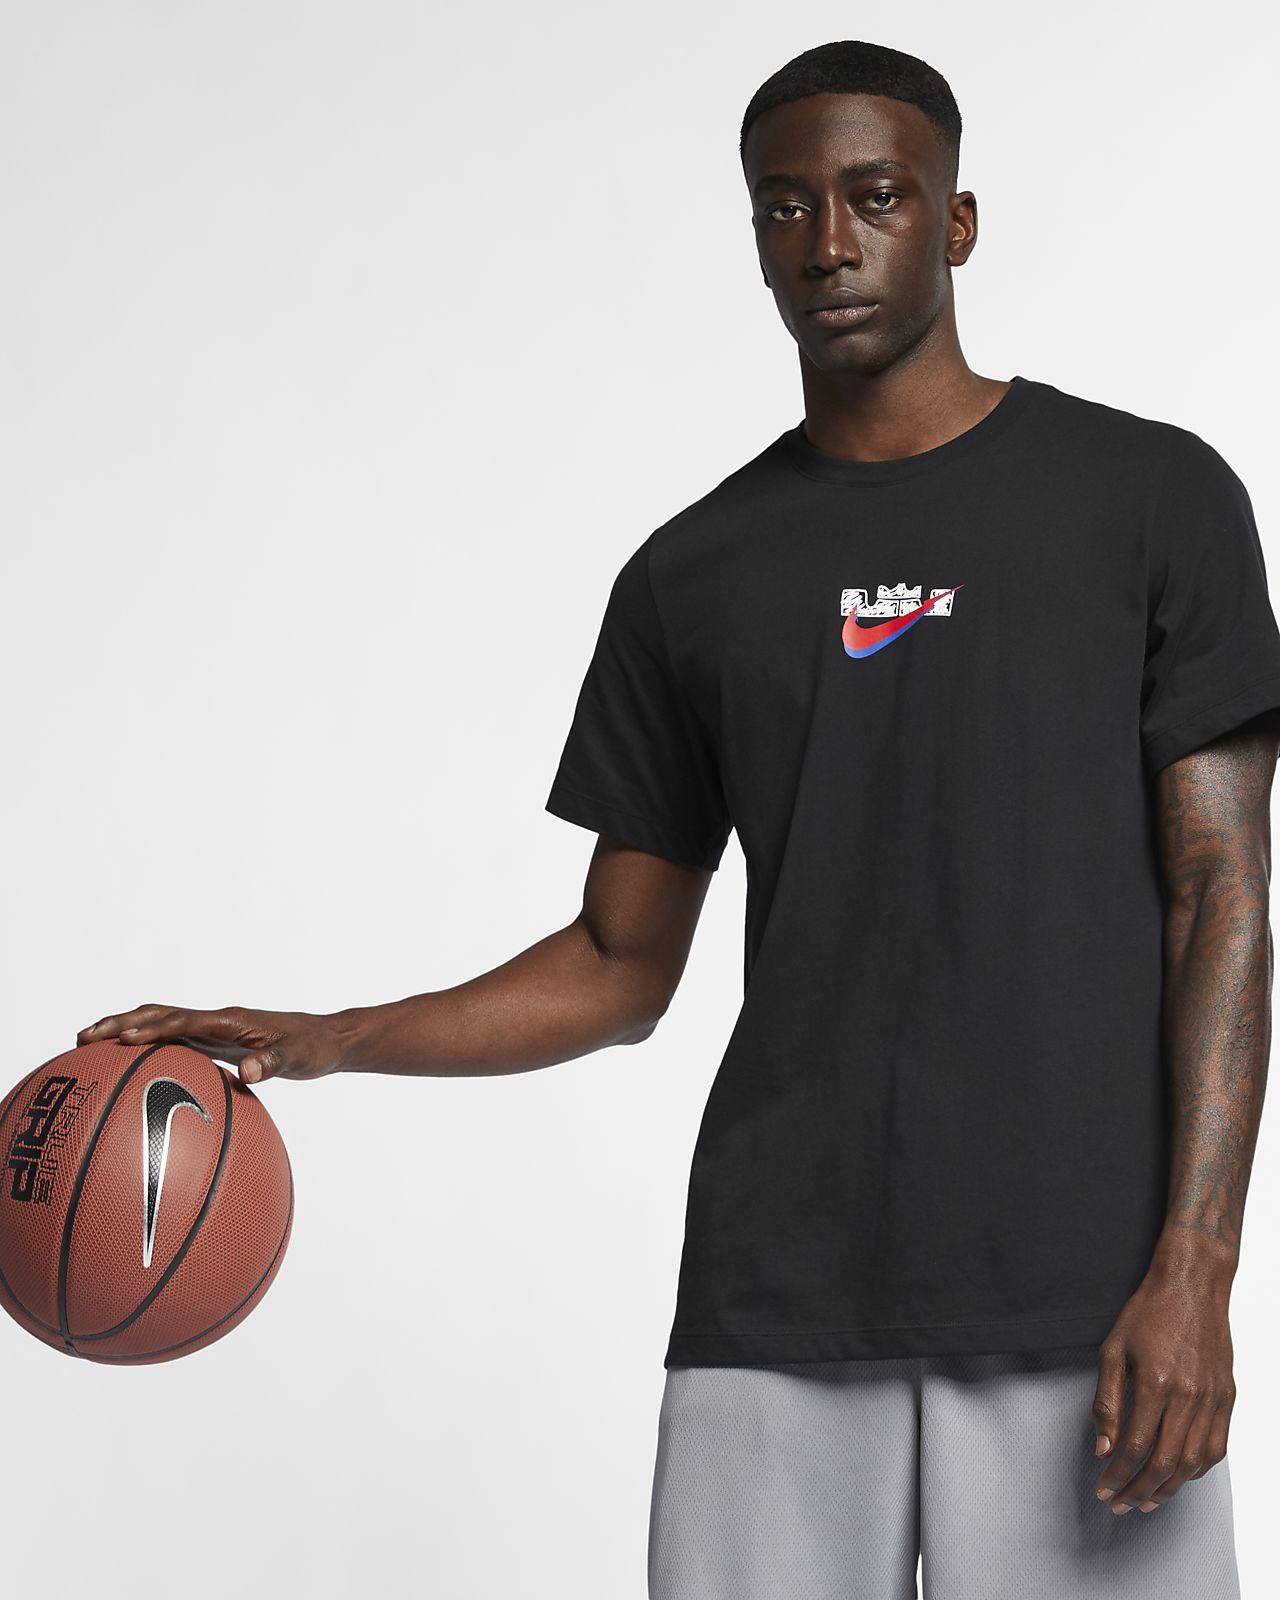 T Fit Nike Men's Dri Lebron ShirtGb vwnyN0Om8